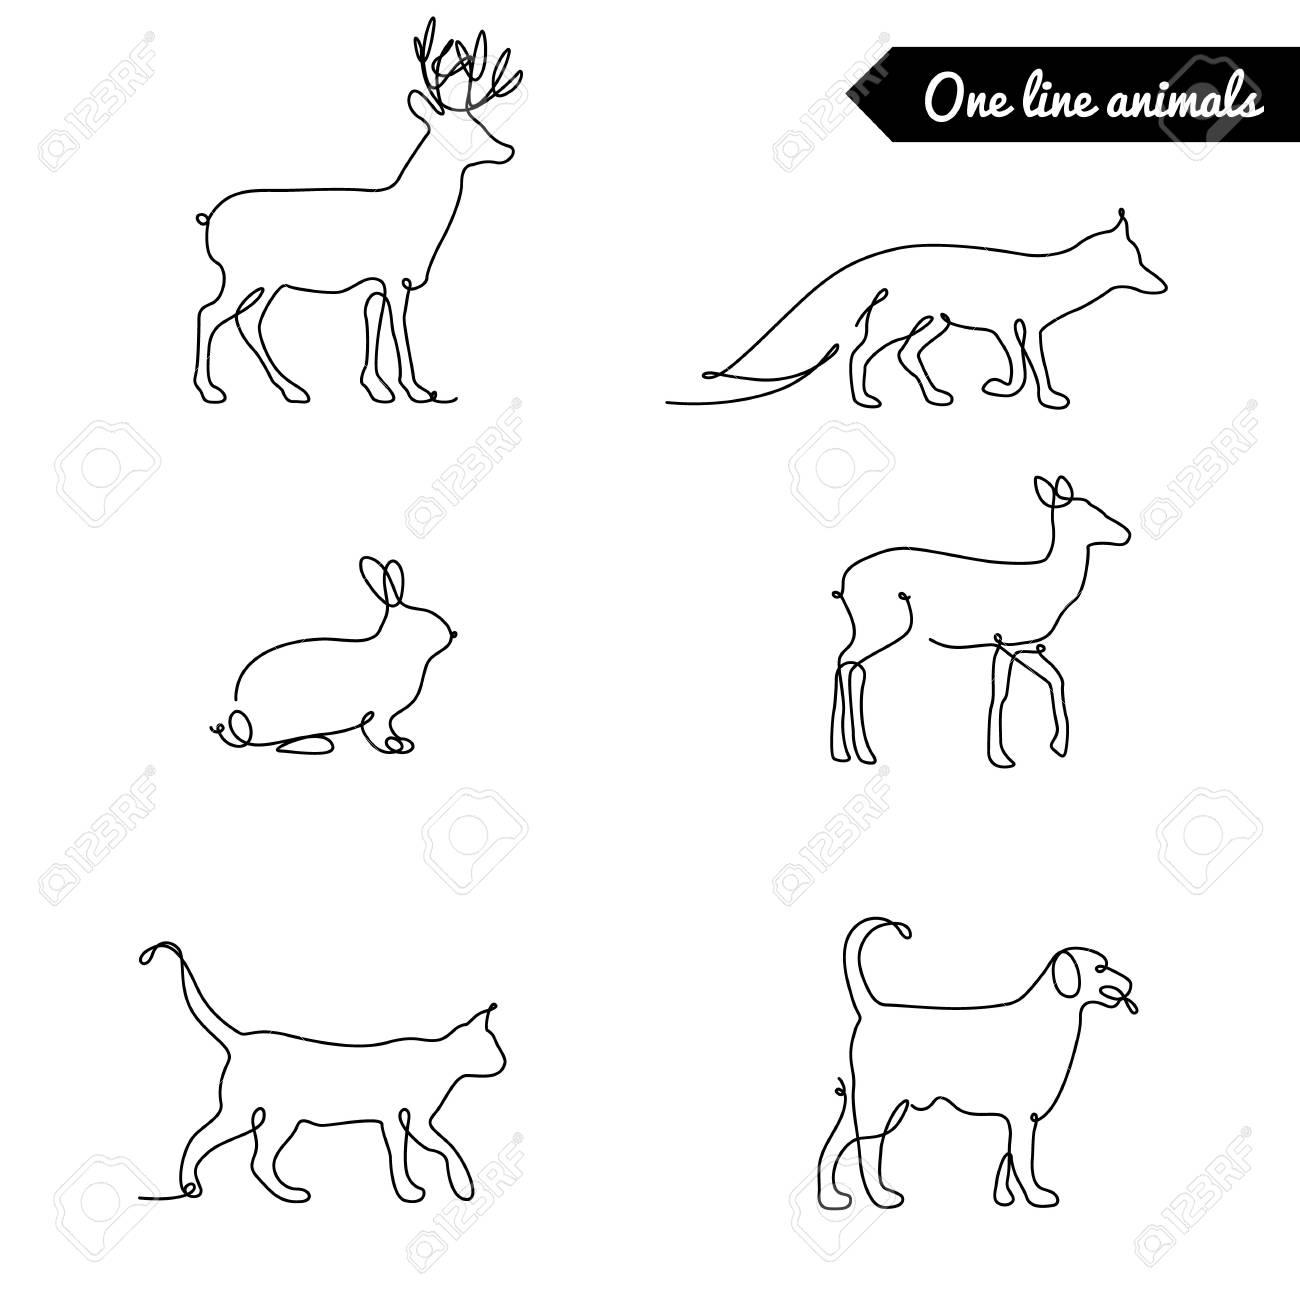 One line animals set stock vector 63507305